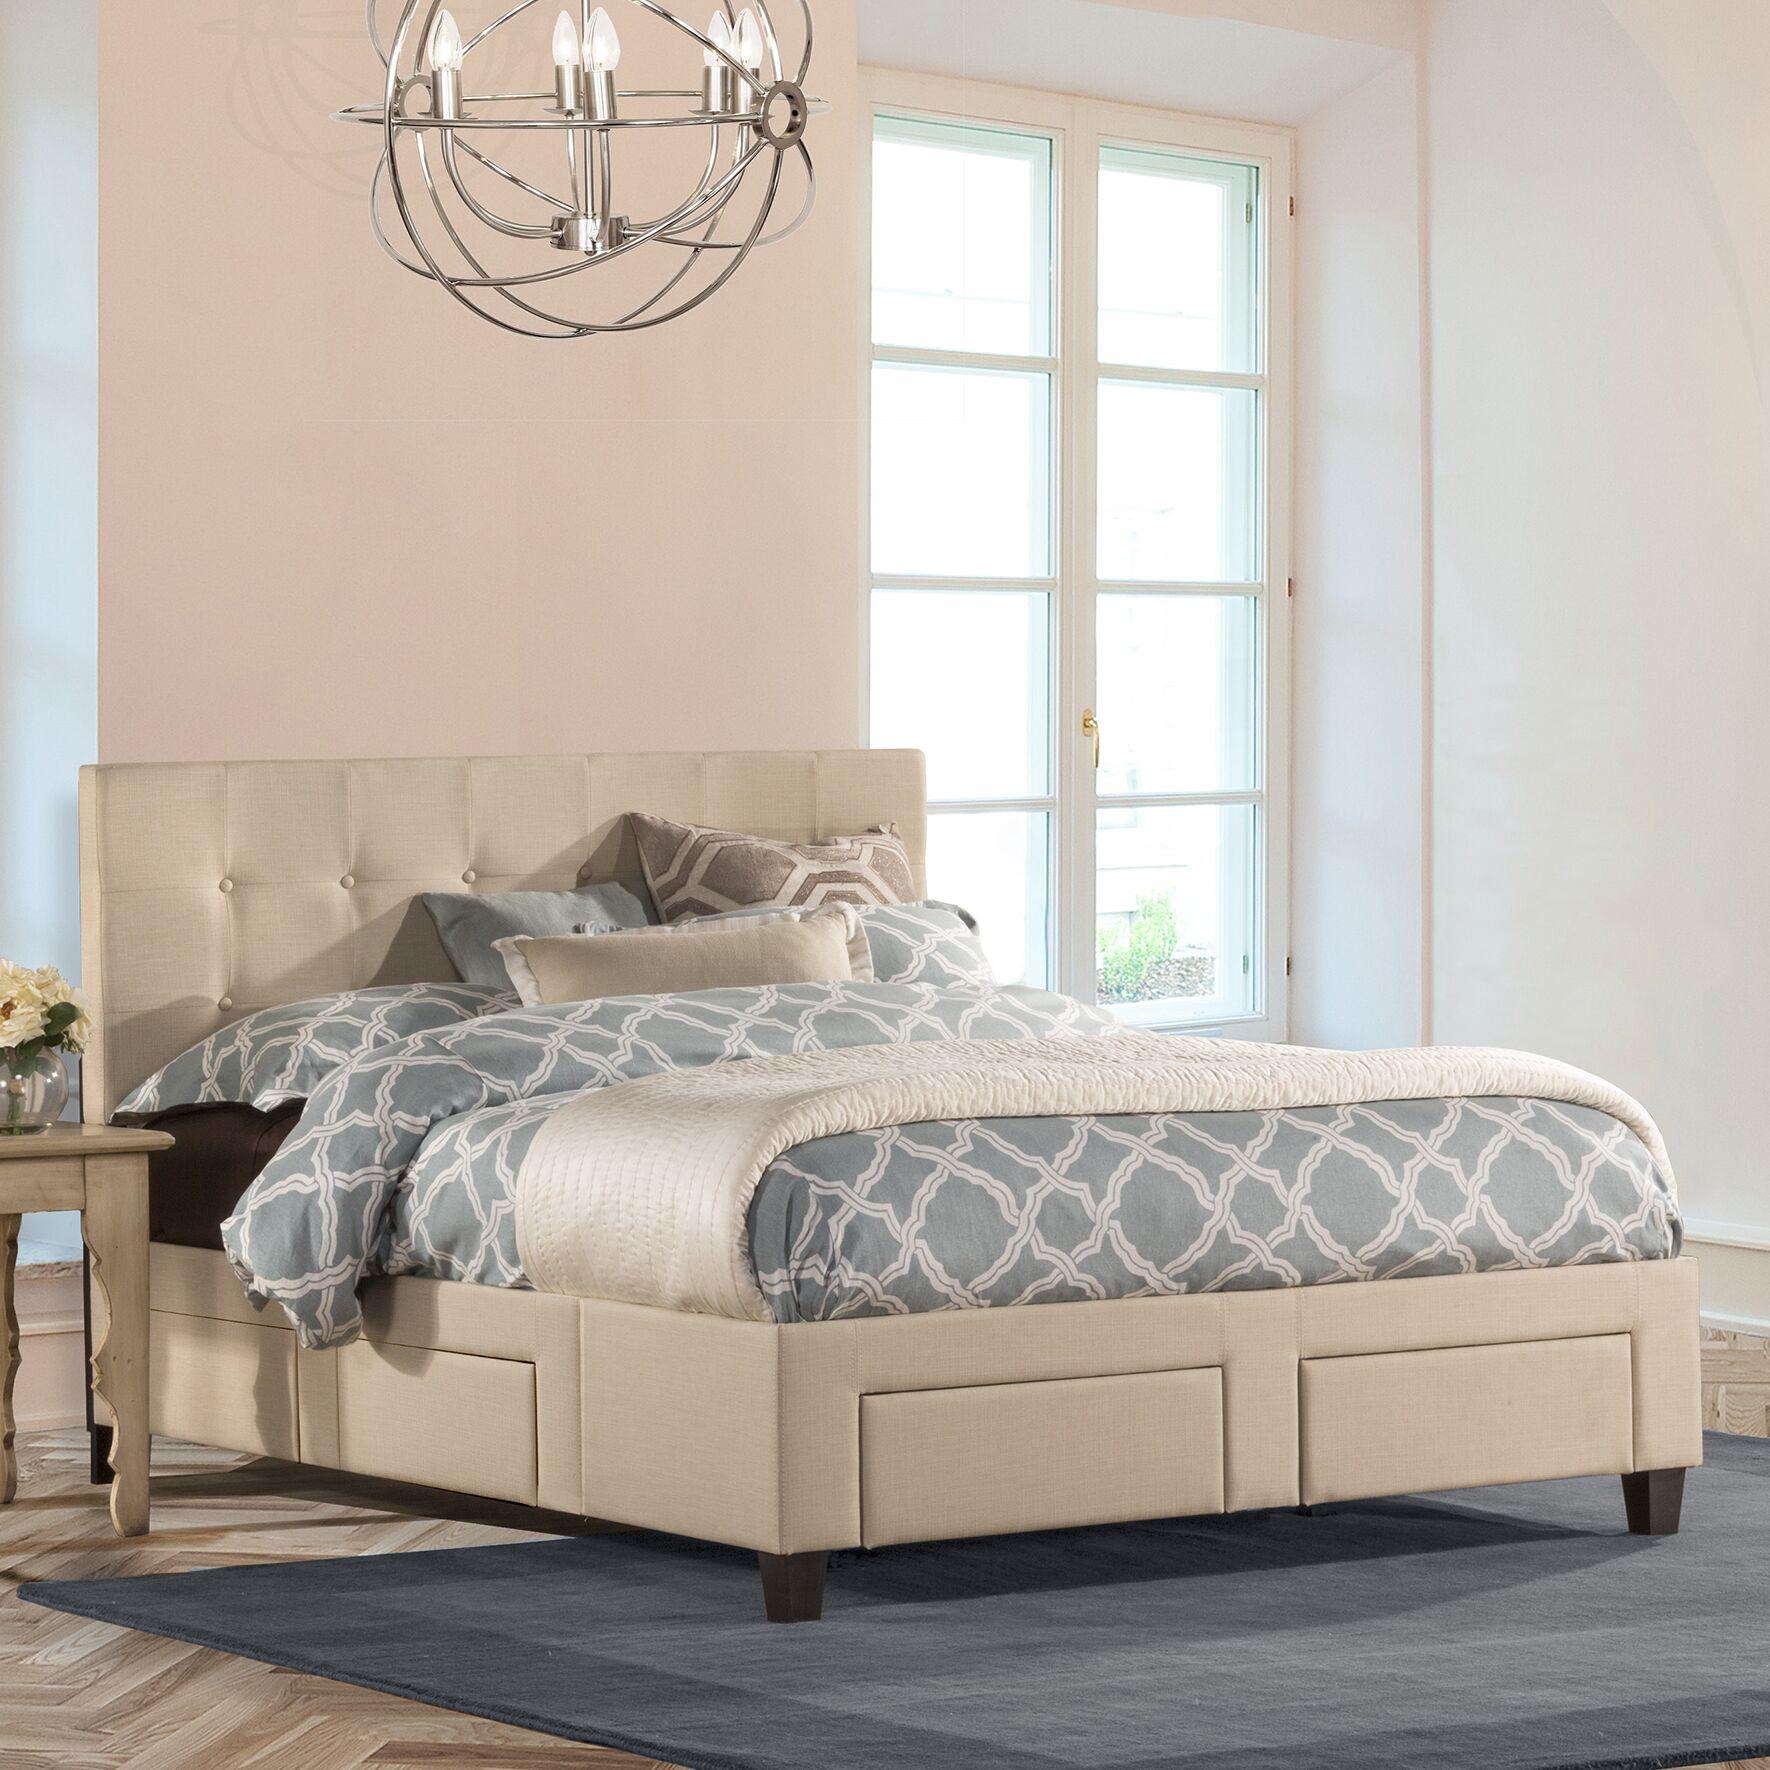 Milla Upholstered Storage Platform Bed Size: Queen